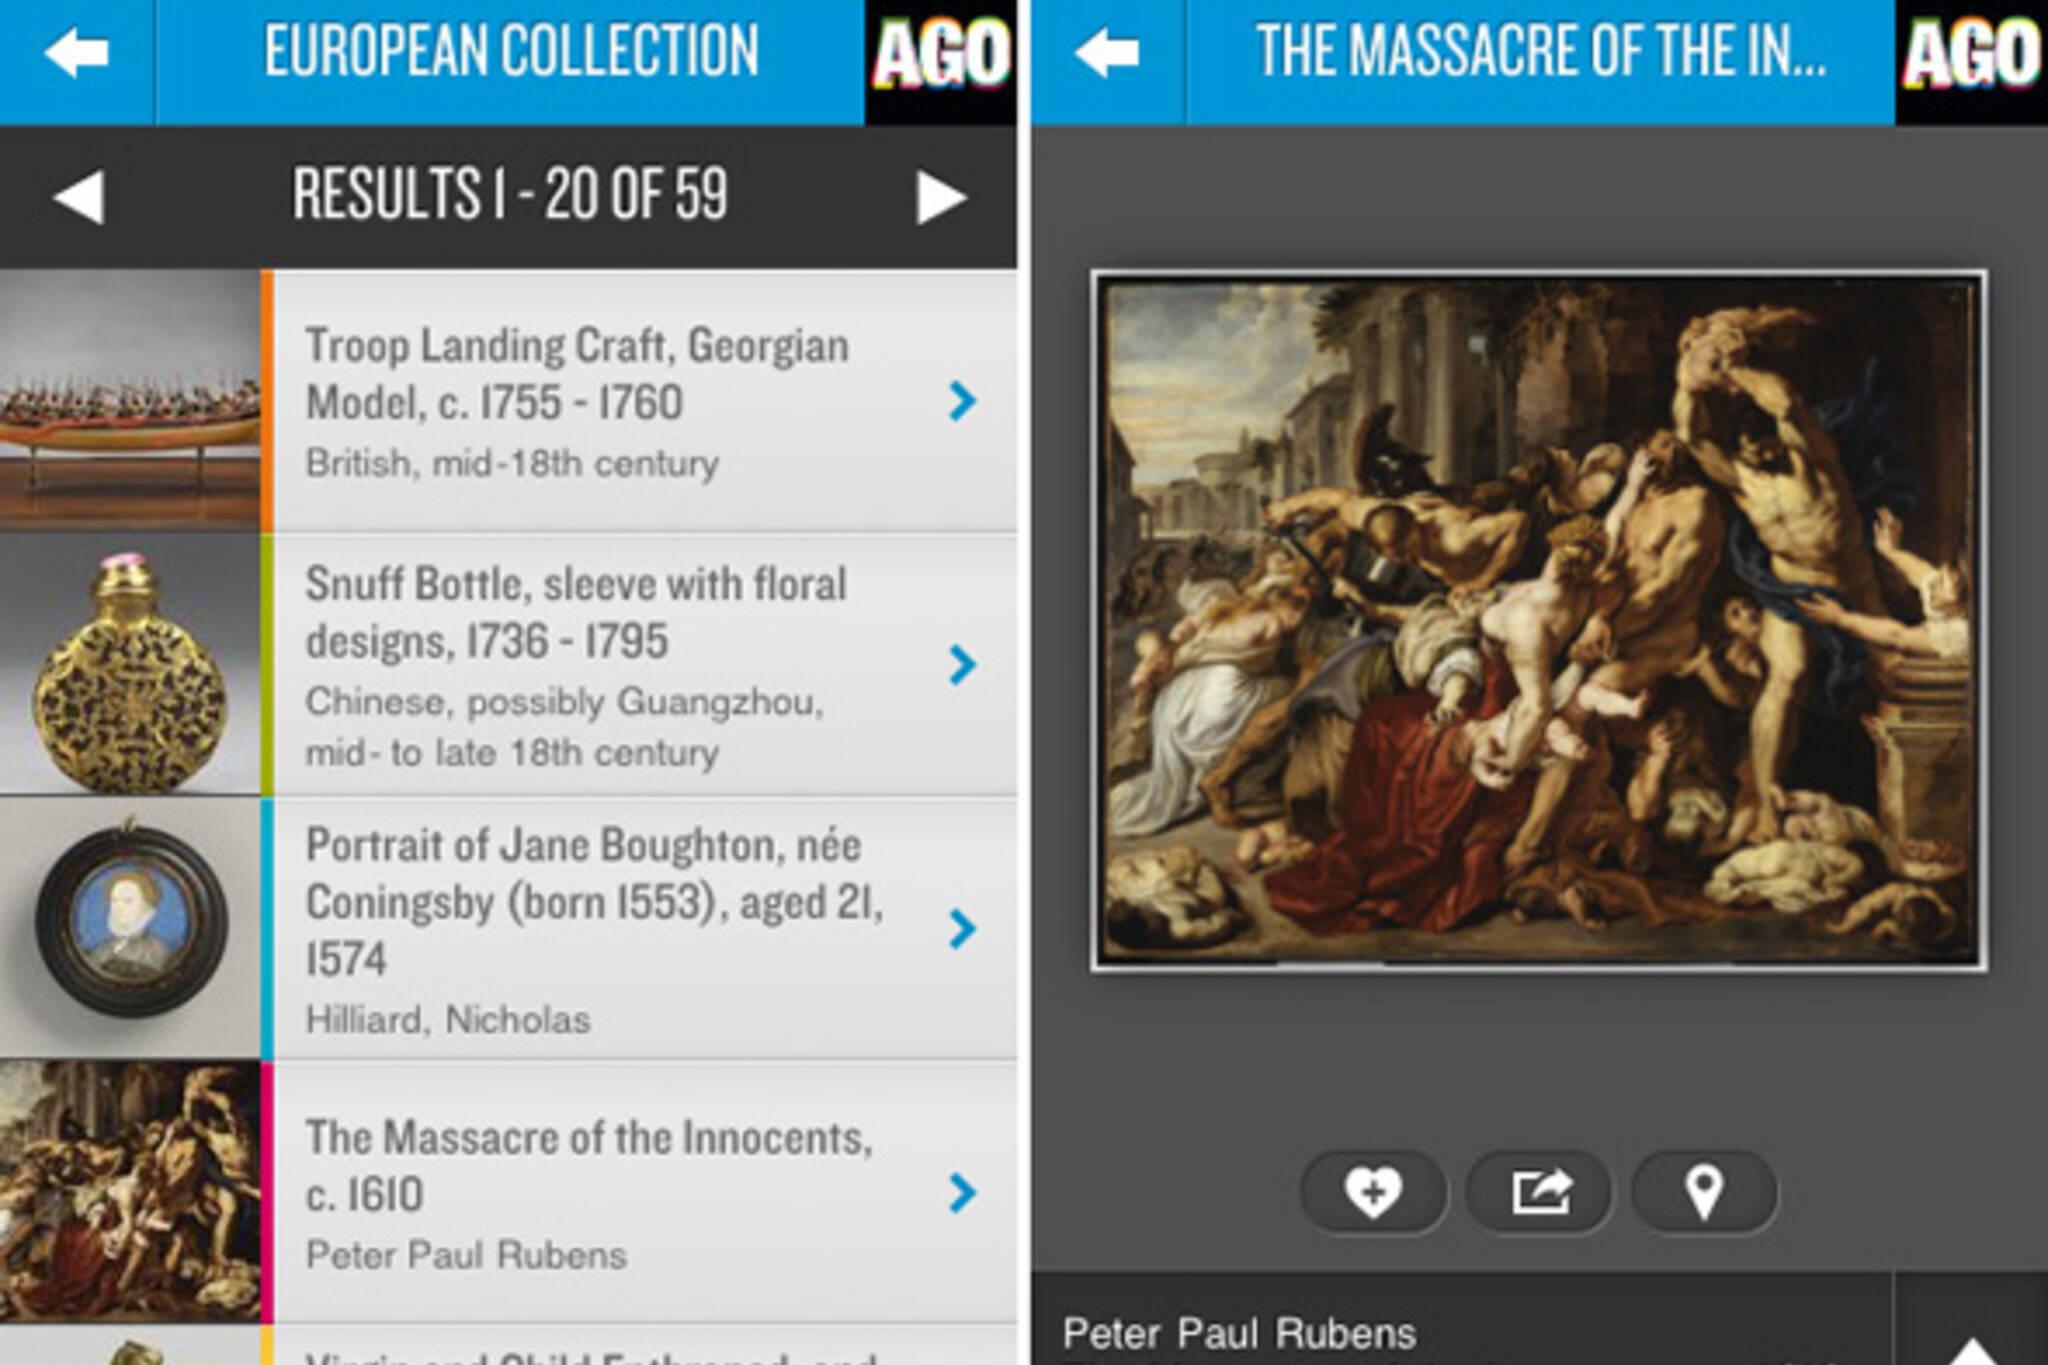 AGO mobile app